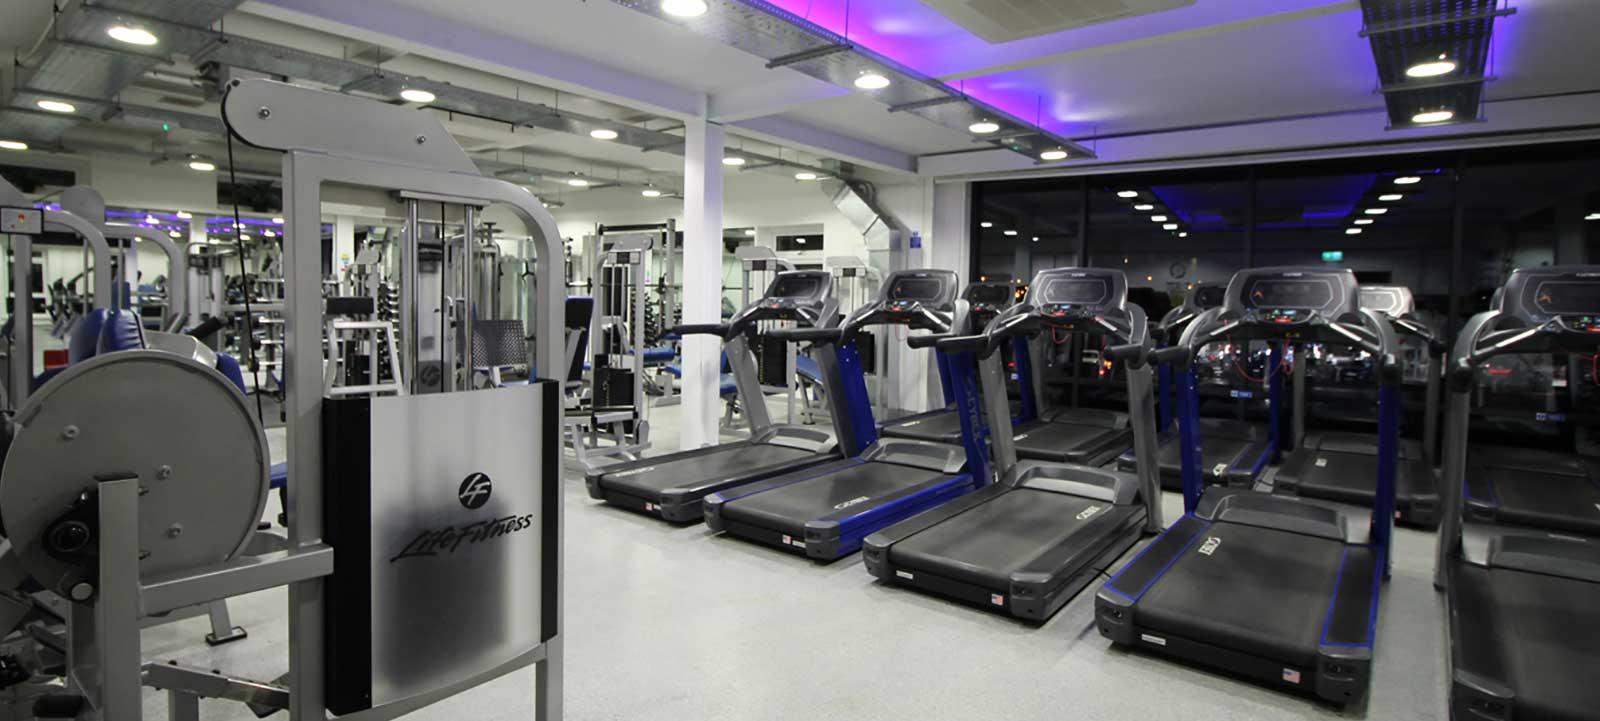 Cardio Room at Swift Fitness York